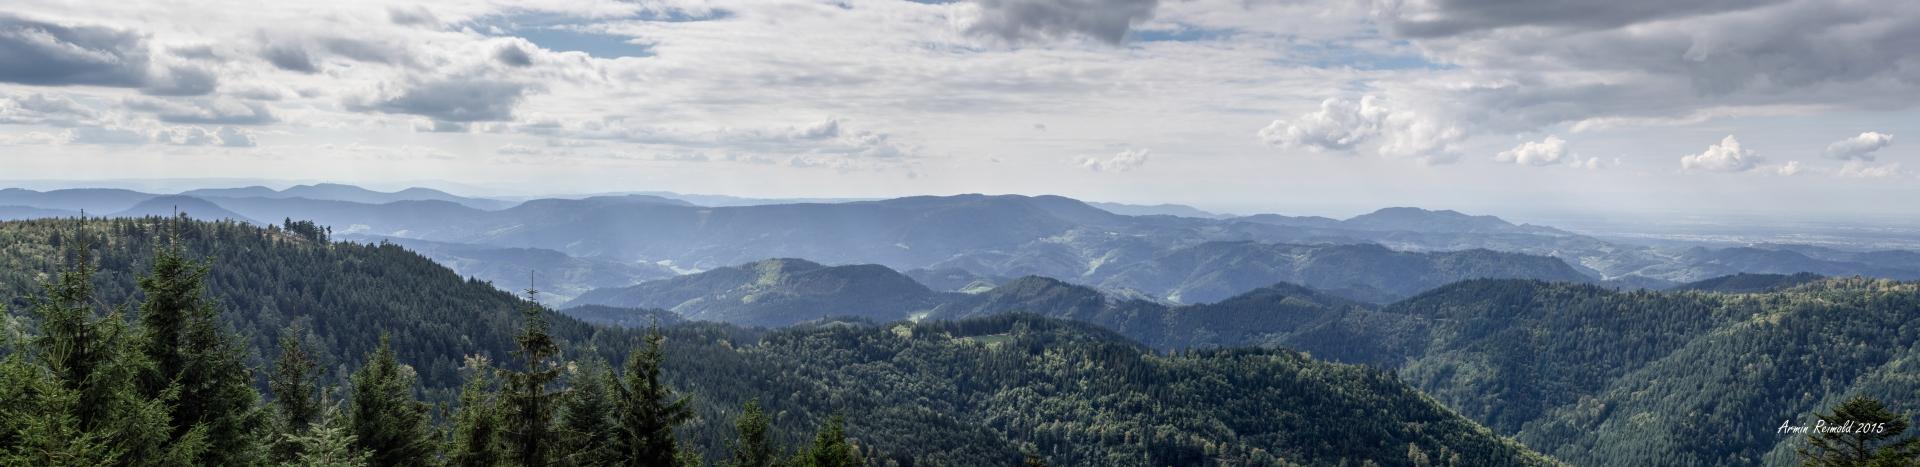 Panorama Nordschwarzwald